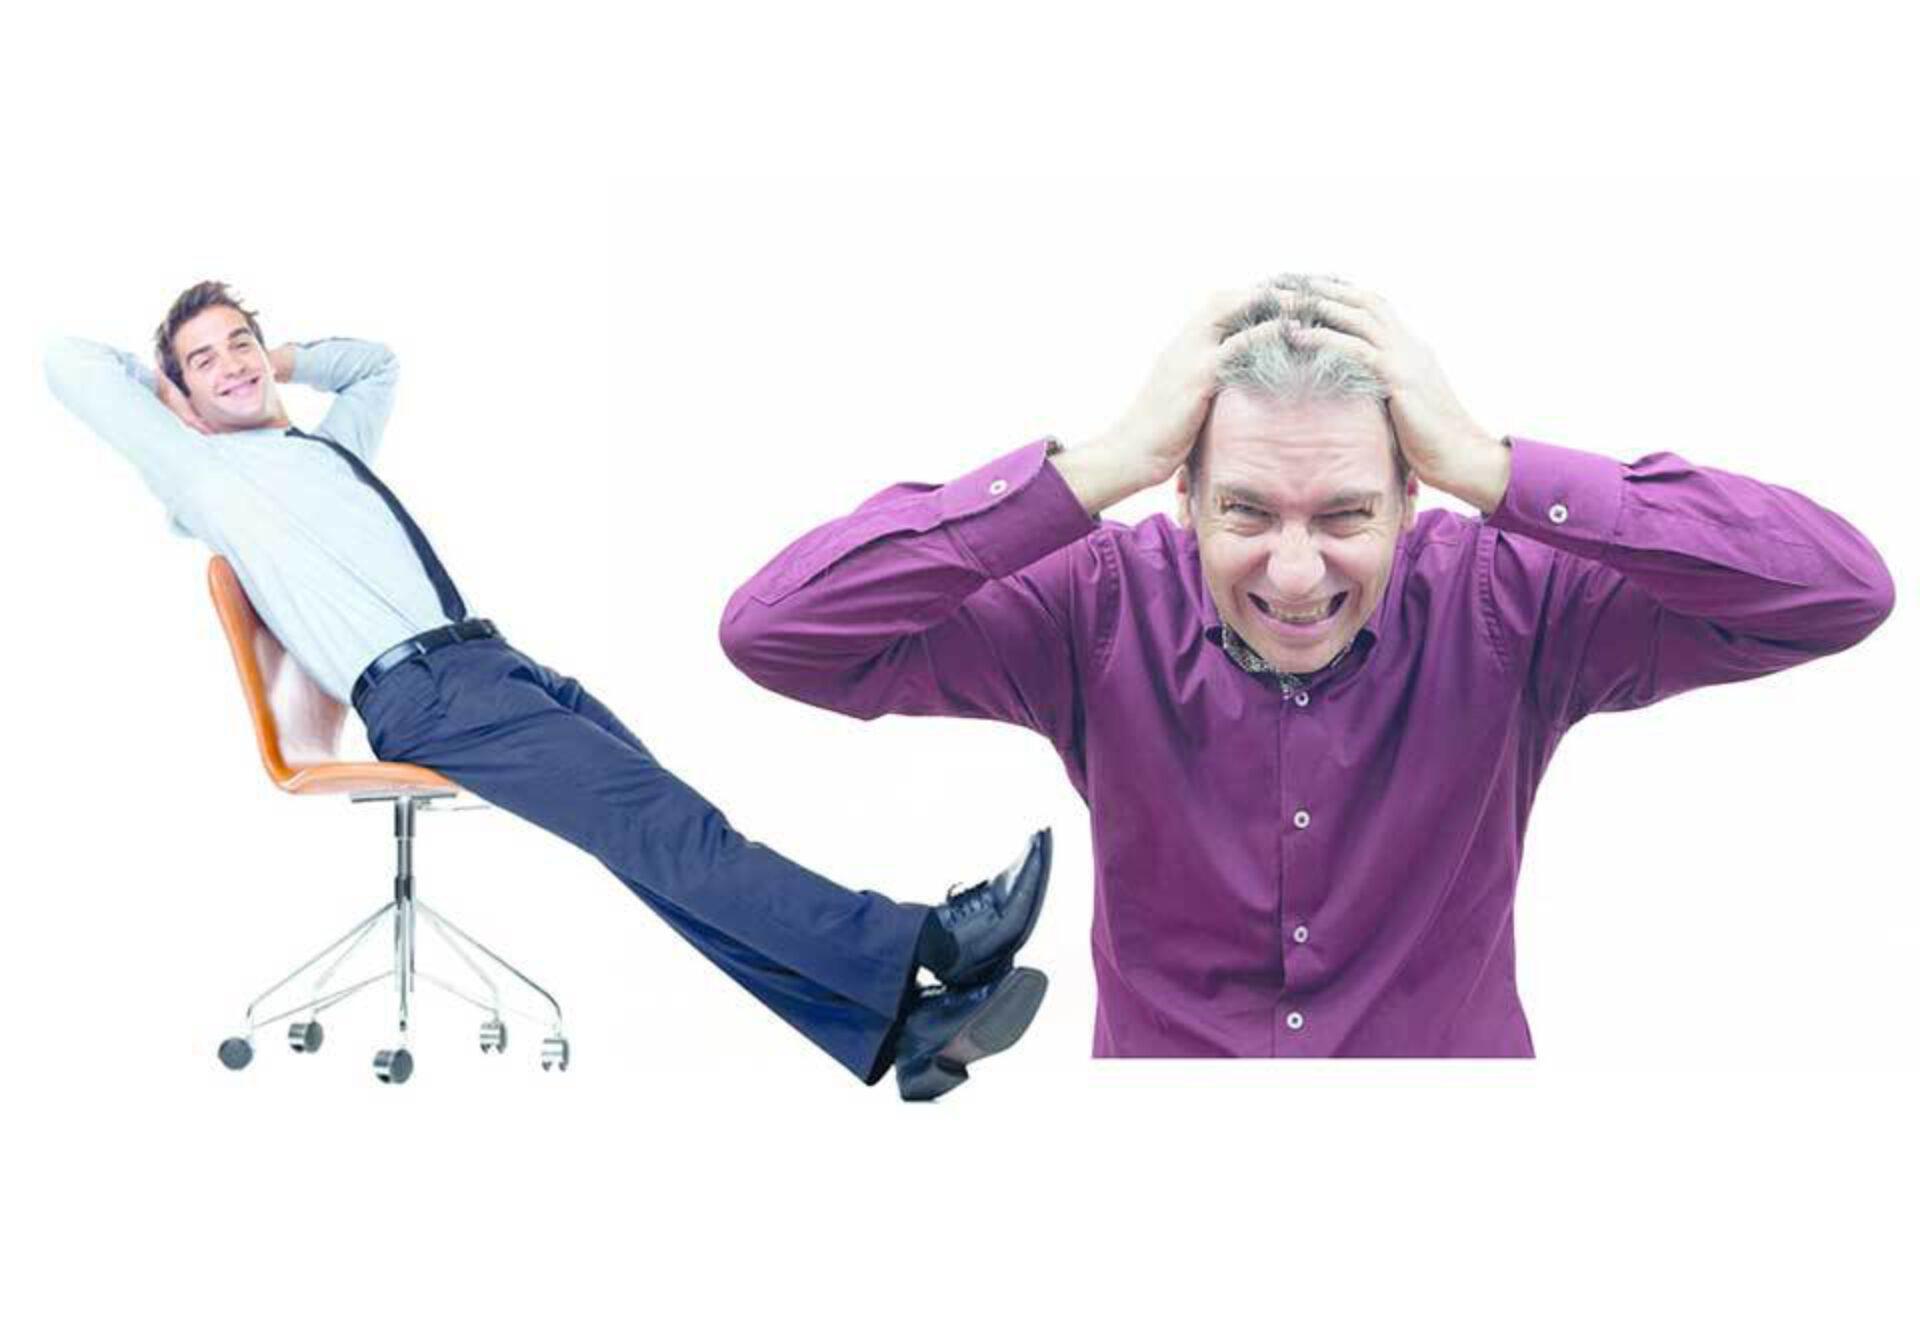 Chillkip of stresskip? Doe de test!